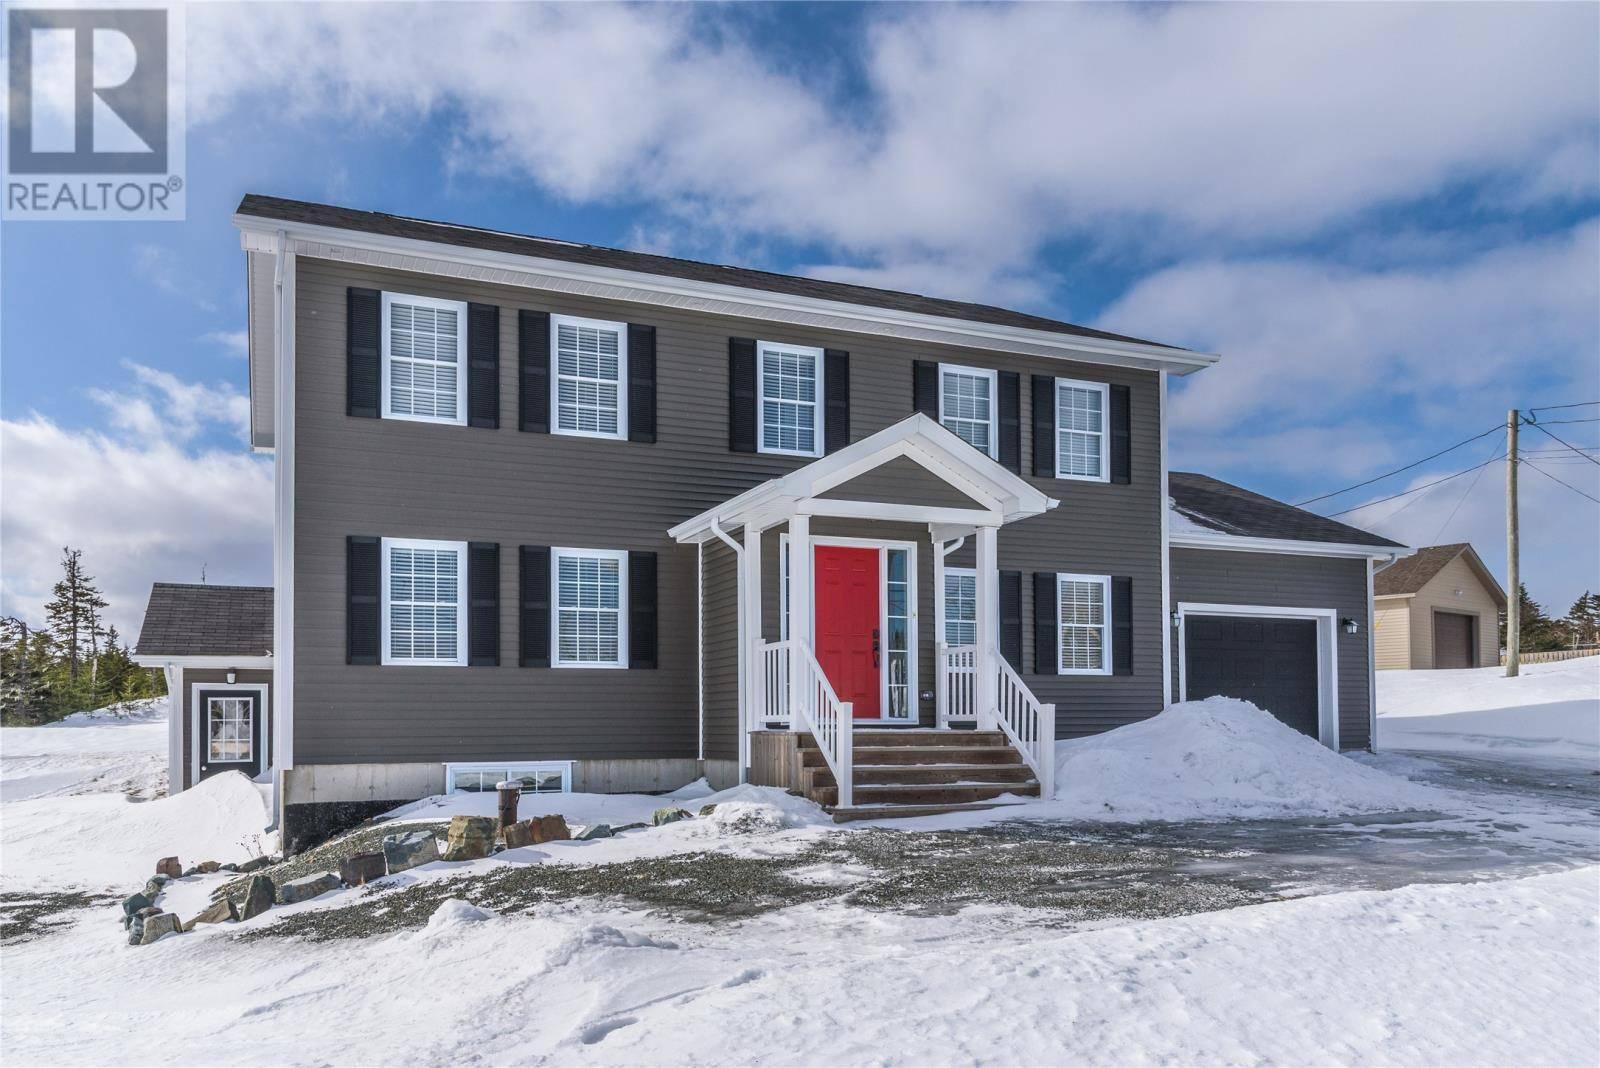 House for sale at 11 Nathaniel Dr Torbay Newfoundland - MLS: 1211629